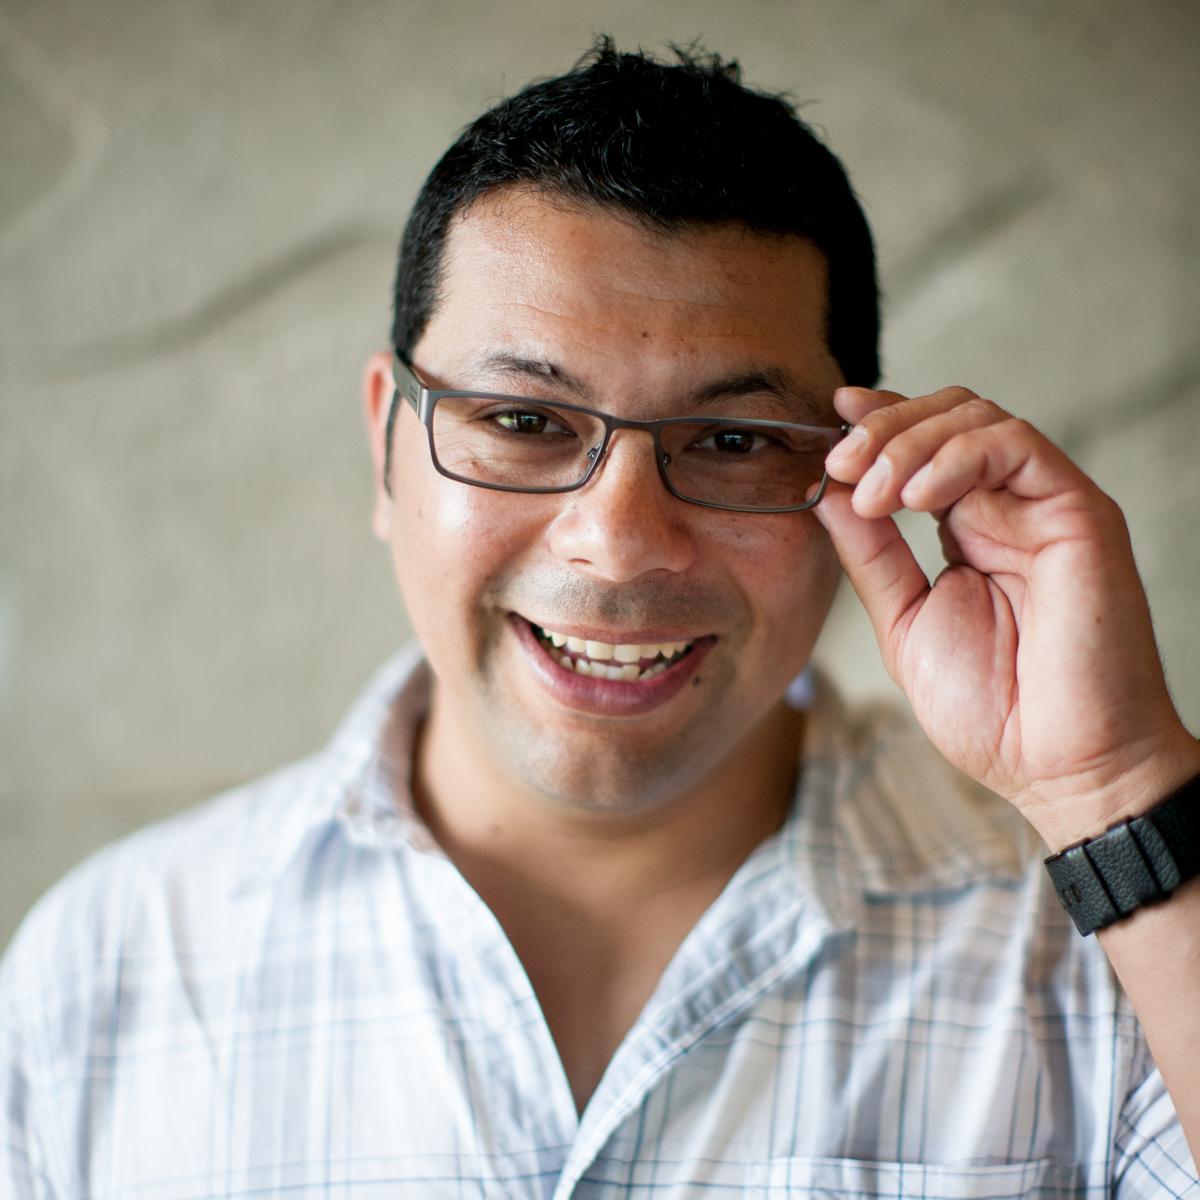 Ruben Ochoa. Photo by Allison V. Smith.